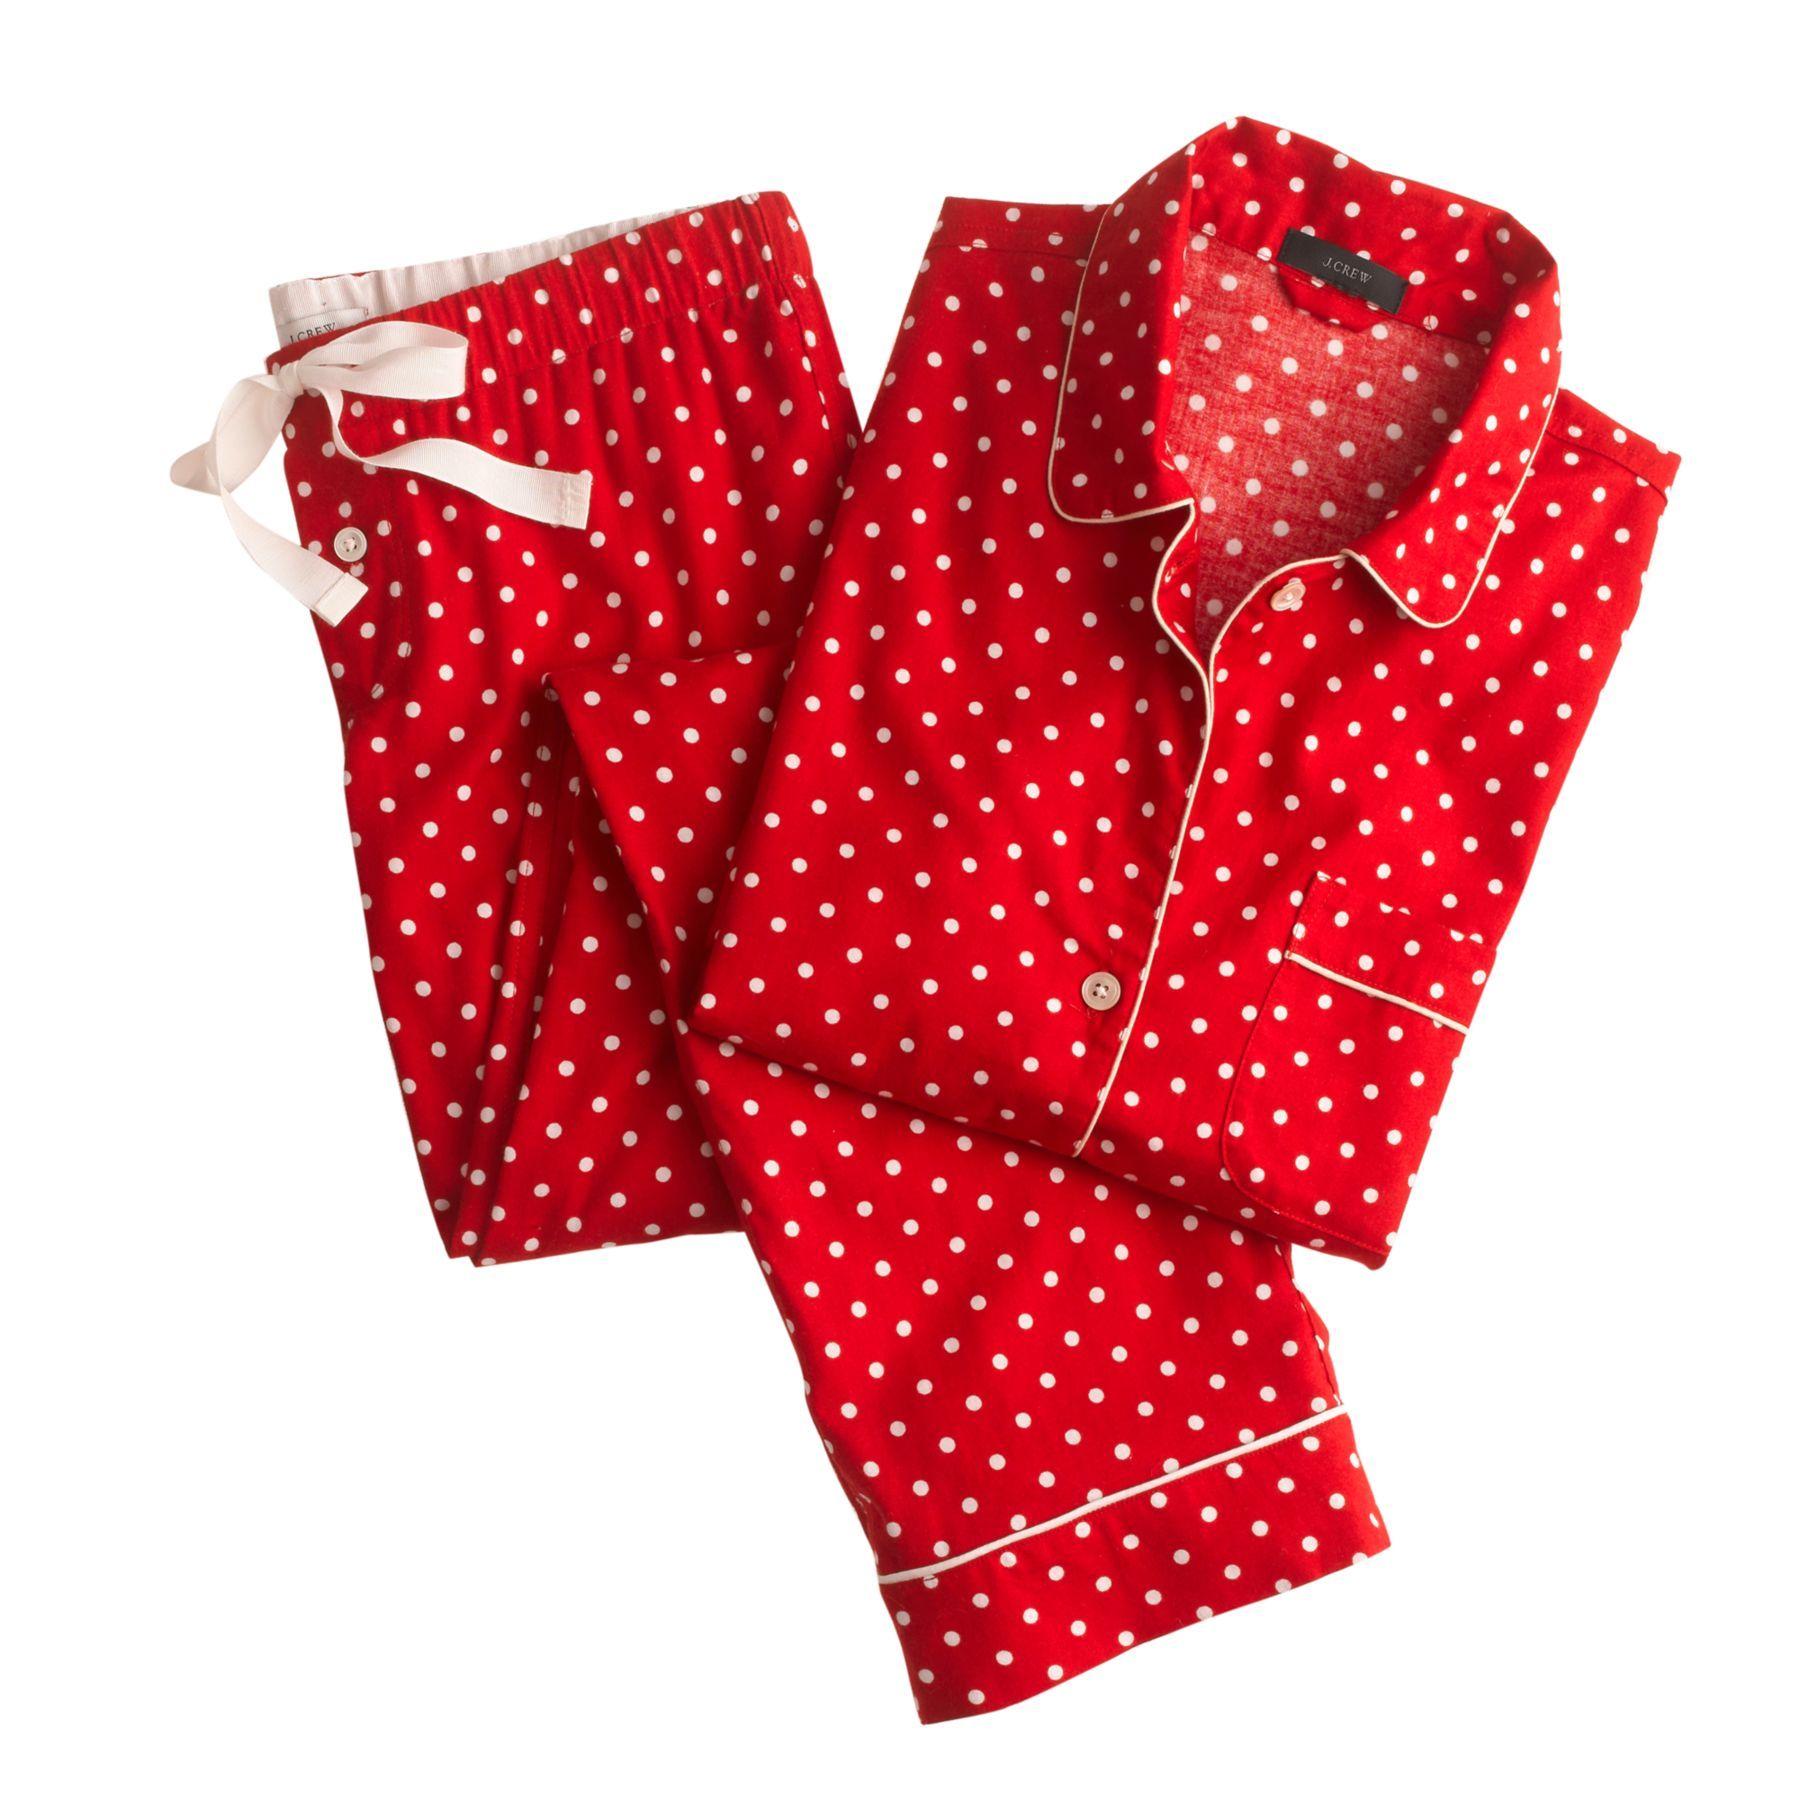 J.Crew women's pajama set in polkadot flannel. Pajama